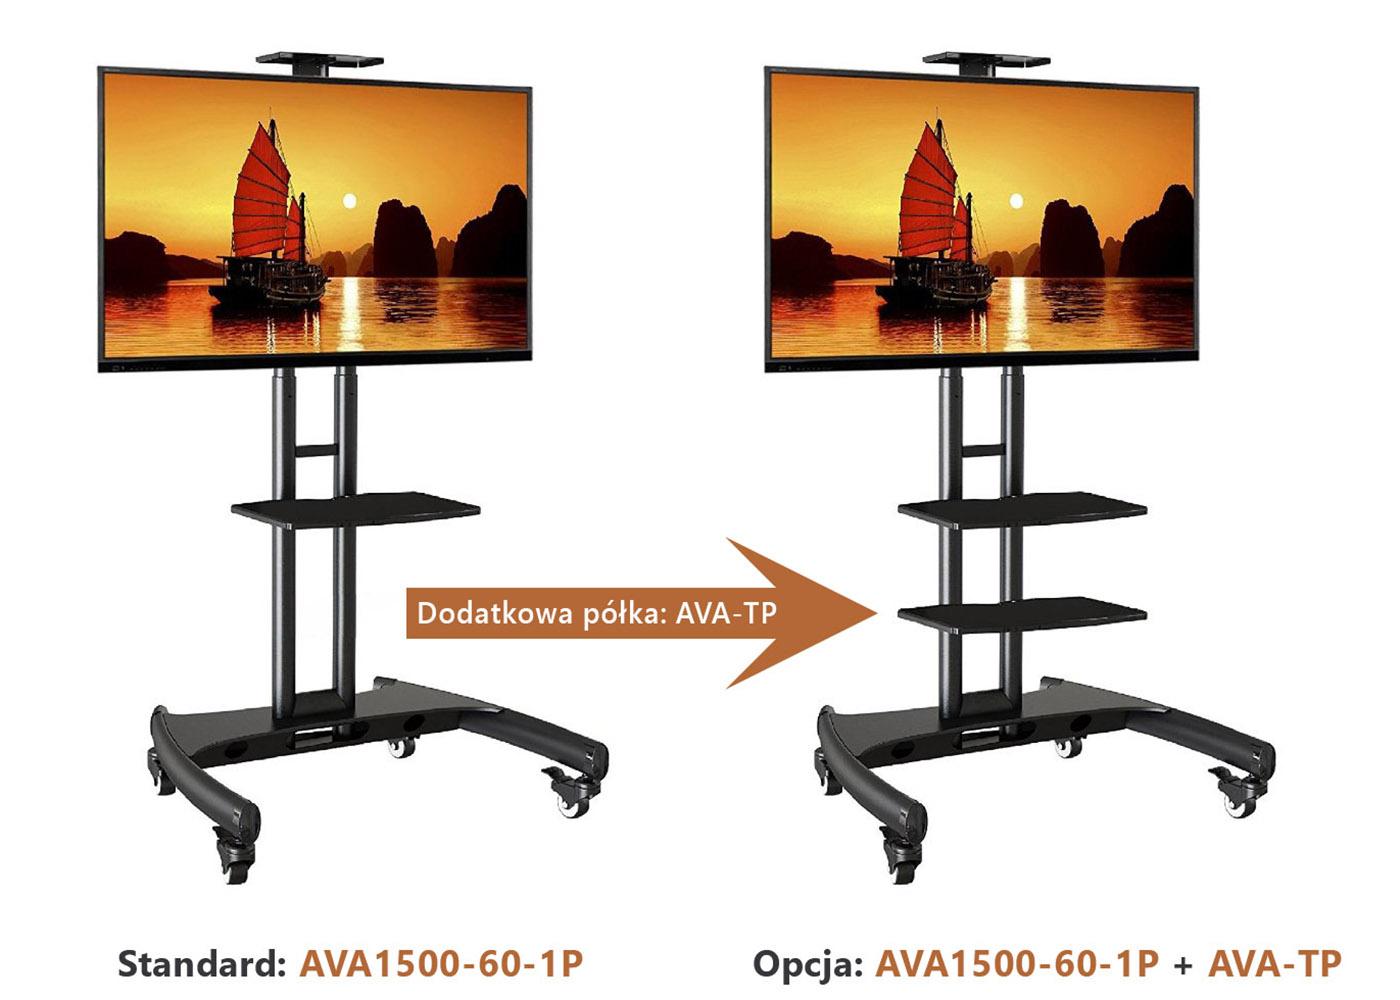 Dodatkowa półka AVA-TP do stojaków AVA1500